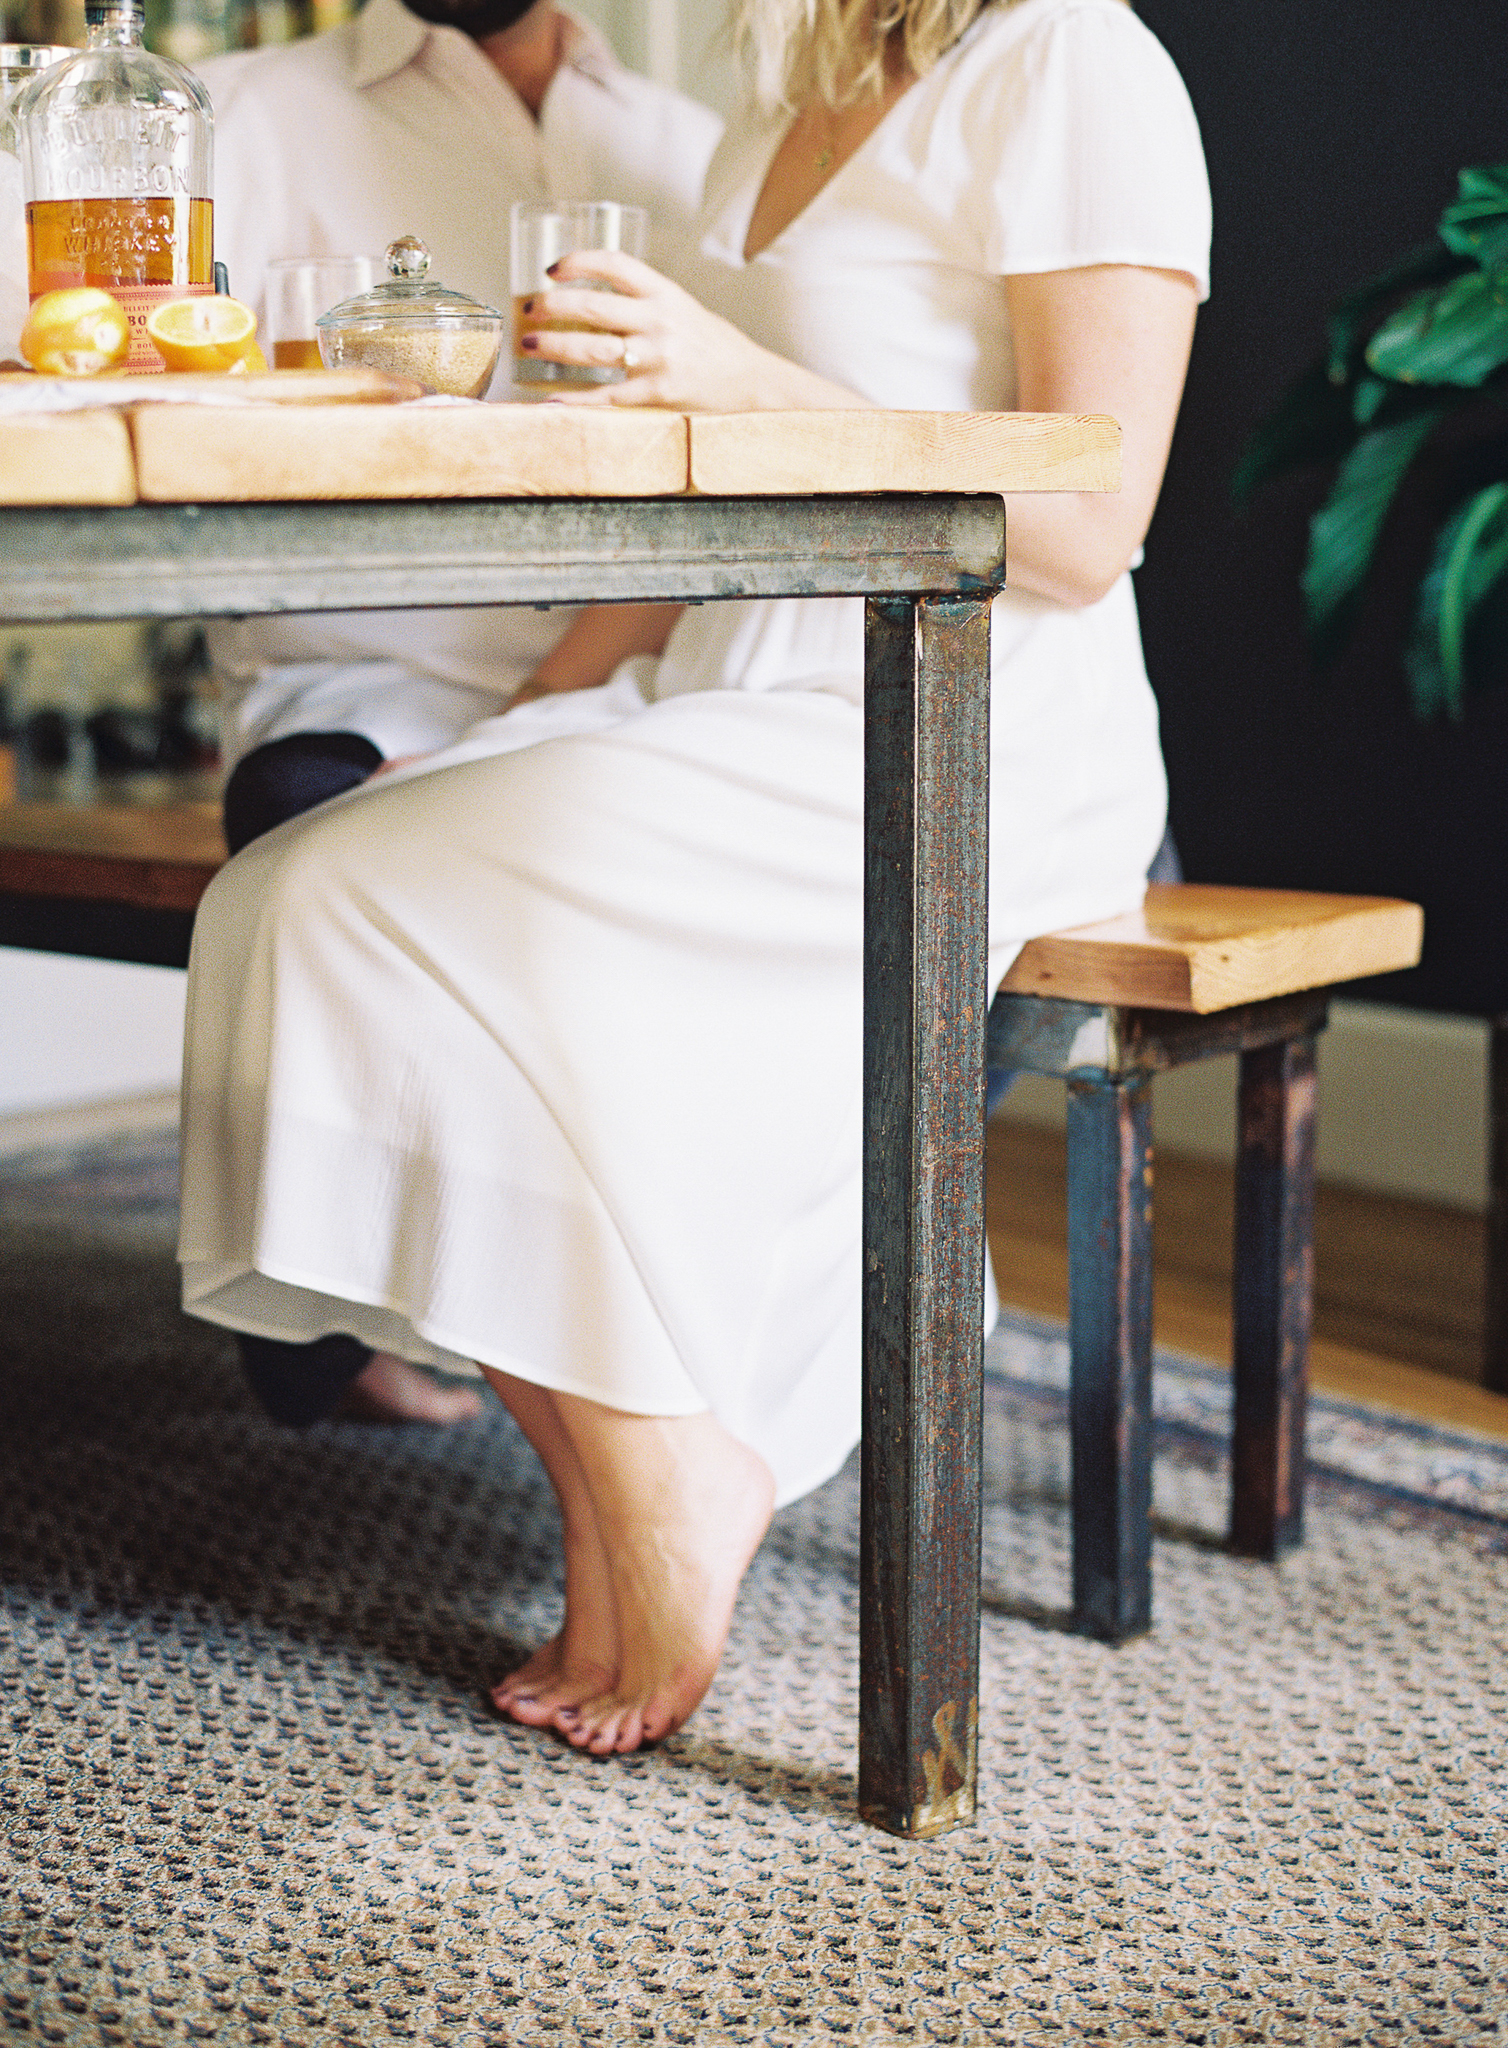 Meghan Mehan Photography - Fine Art Film Wedding Photography - San Francisco   Napa   Sonoma   Big Sur   Chicago   Minneapolis   Milwaukee   Lake Geneva   Door County   Wisconsin 039.jpg